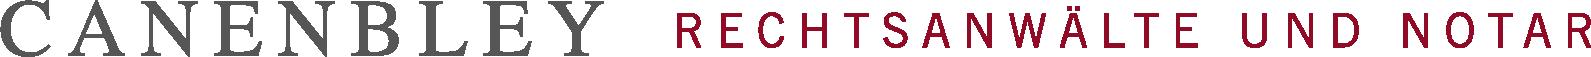 rae-canenbley-logo